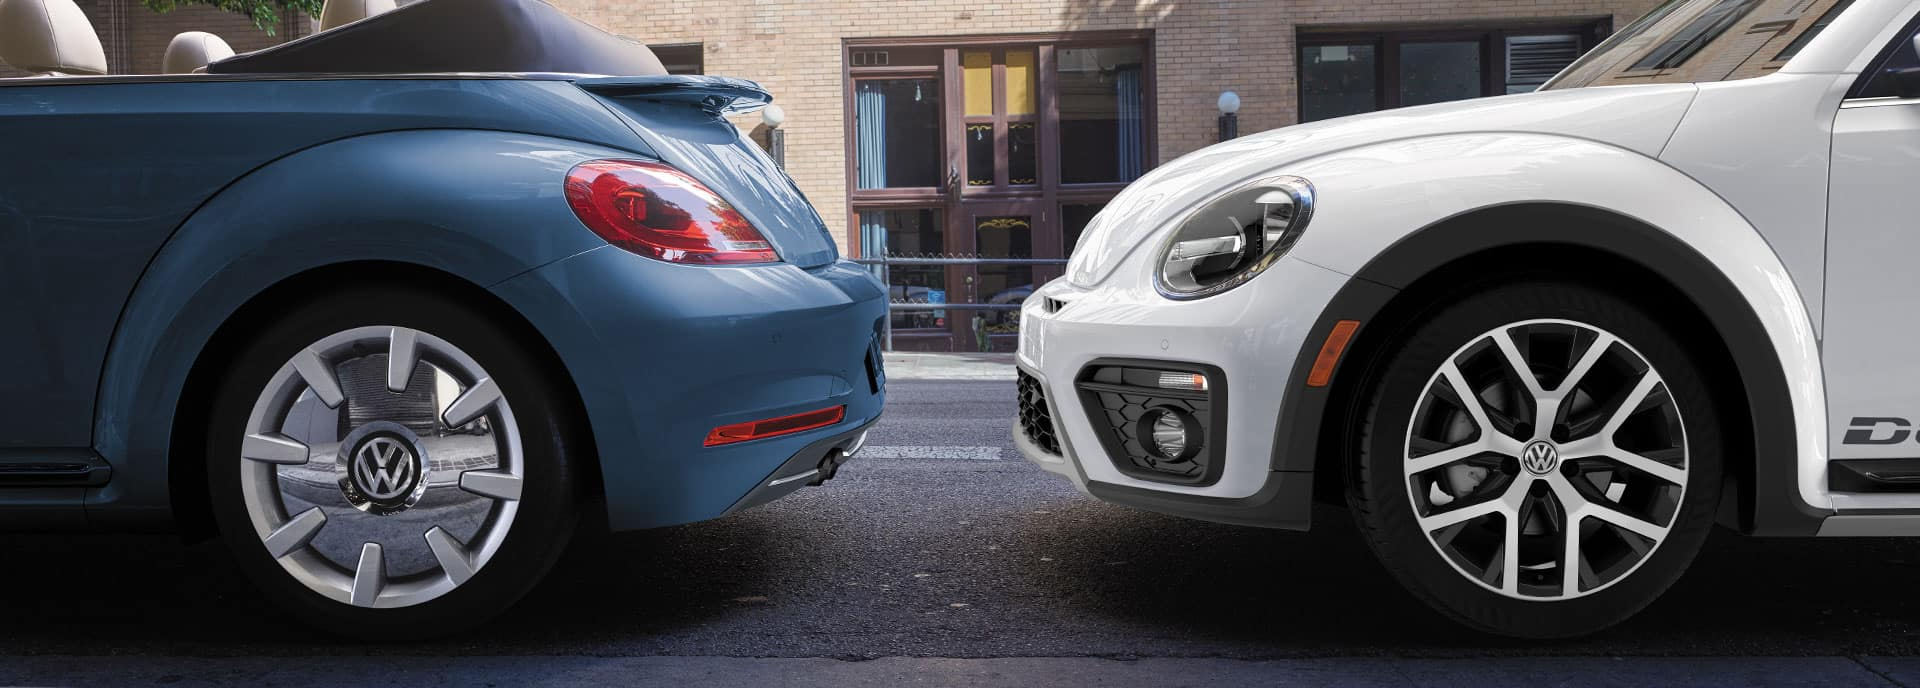 Pair 2019 VW Beetle Convertibles